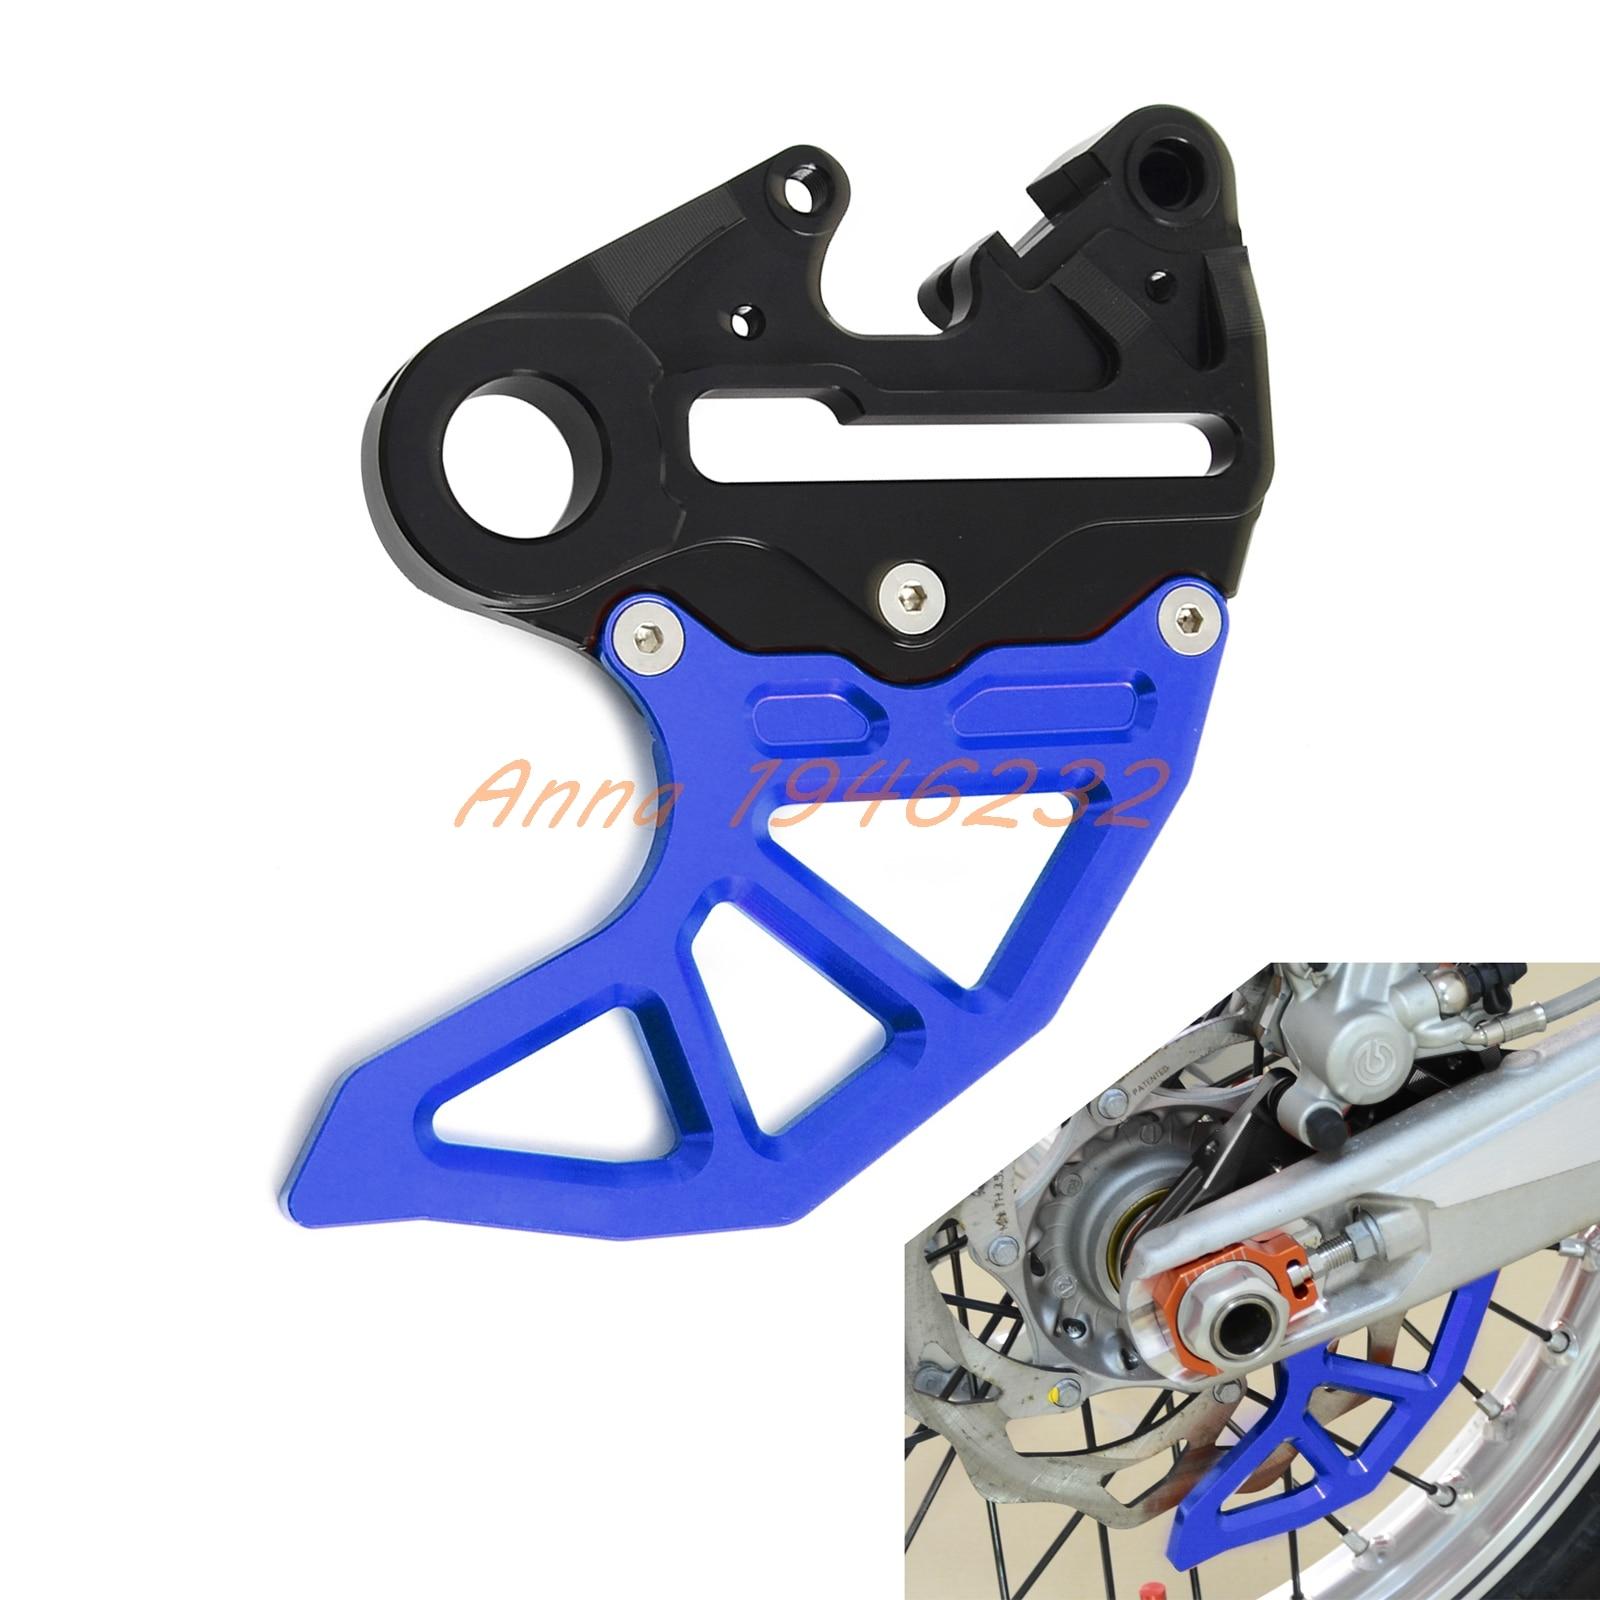 Caliper Support Rear Brake Disc Guard For Husaberg TE 125/250/300 2011-2014 FE/FS/FX 250/350/390/450/501/570 2009-2014